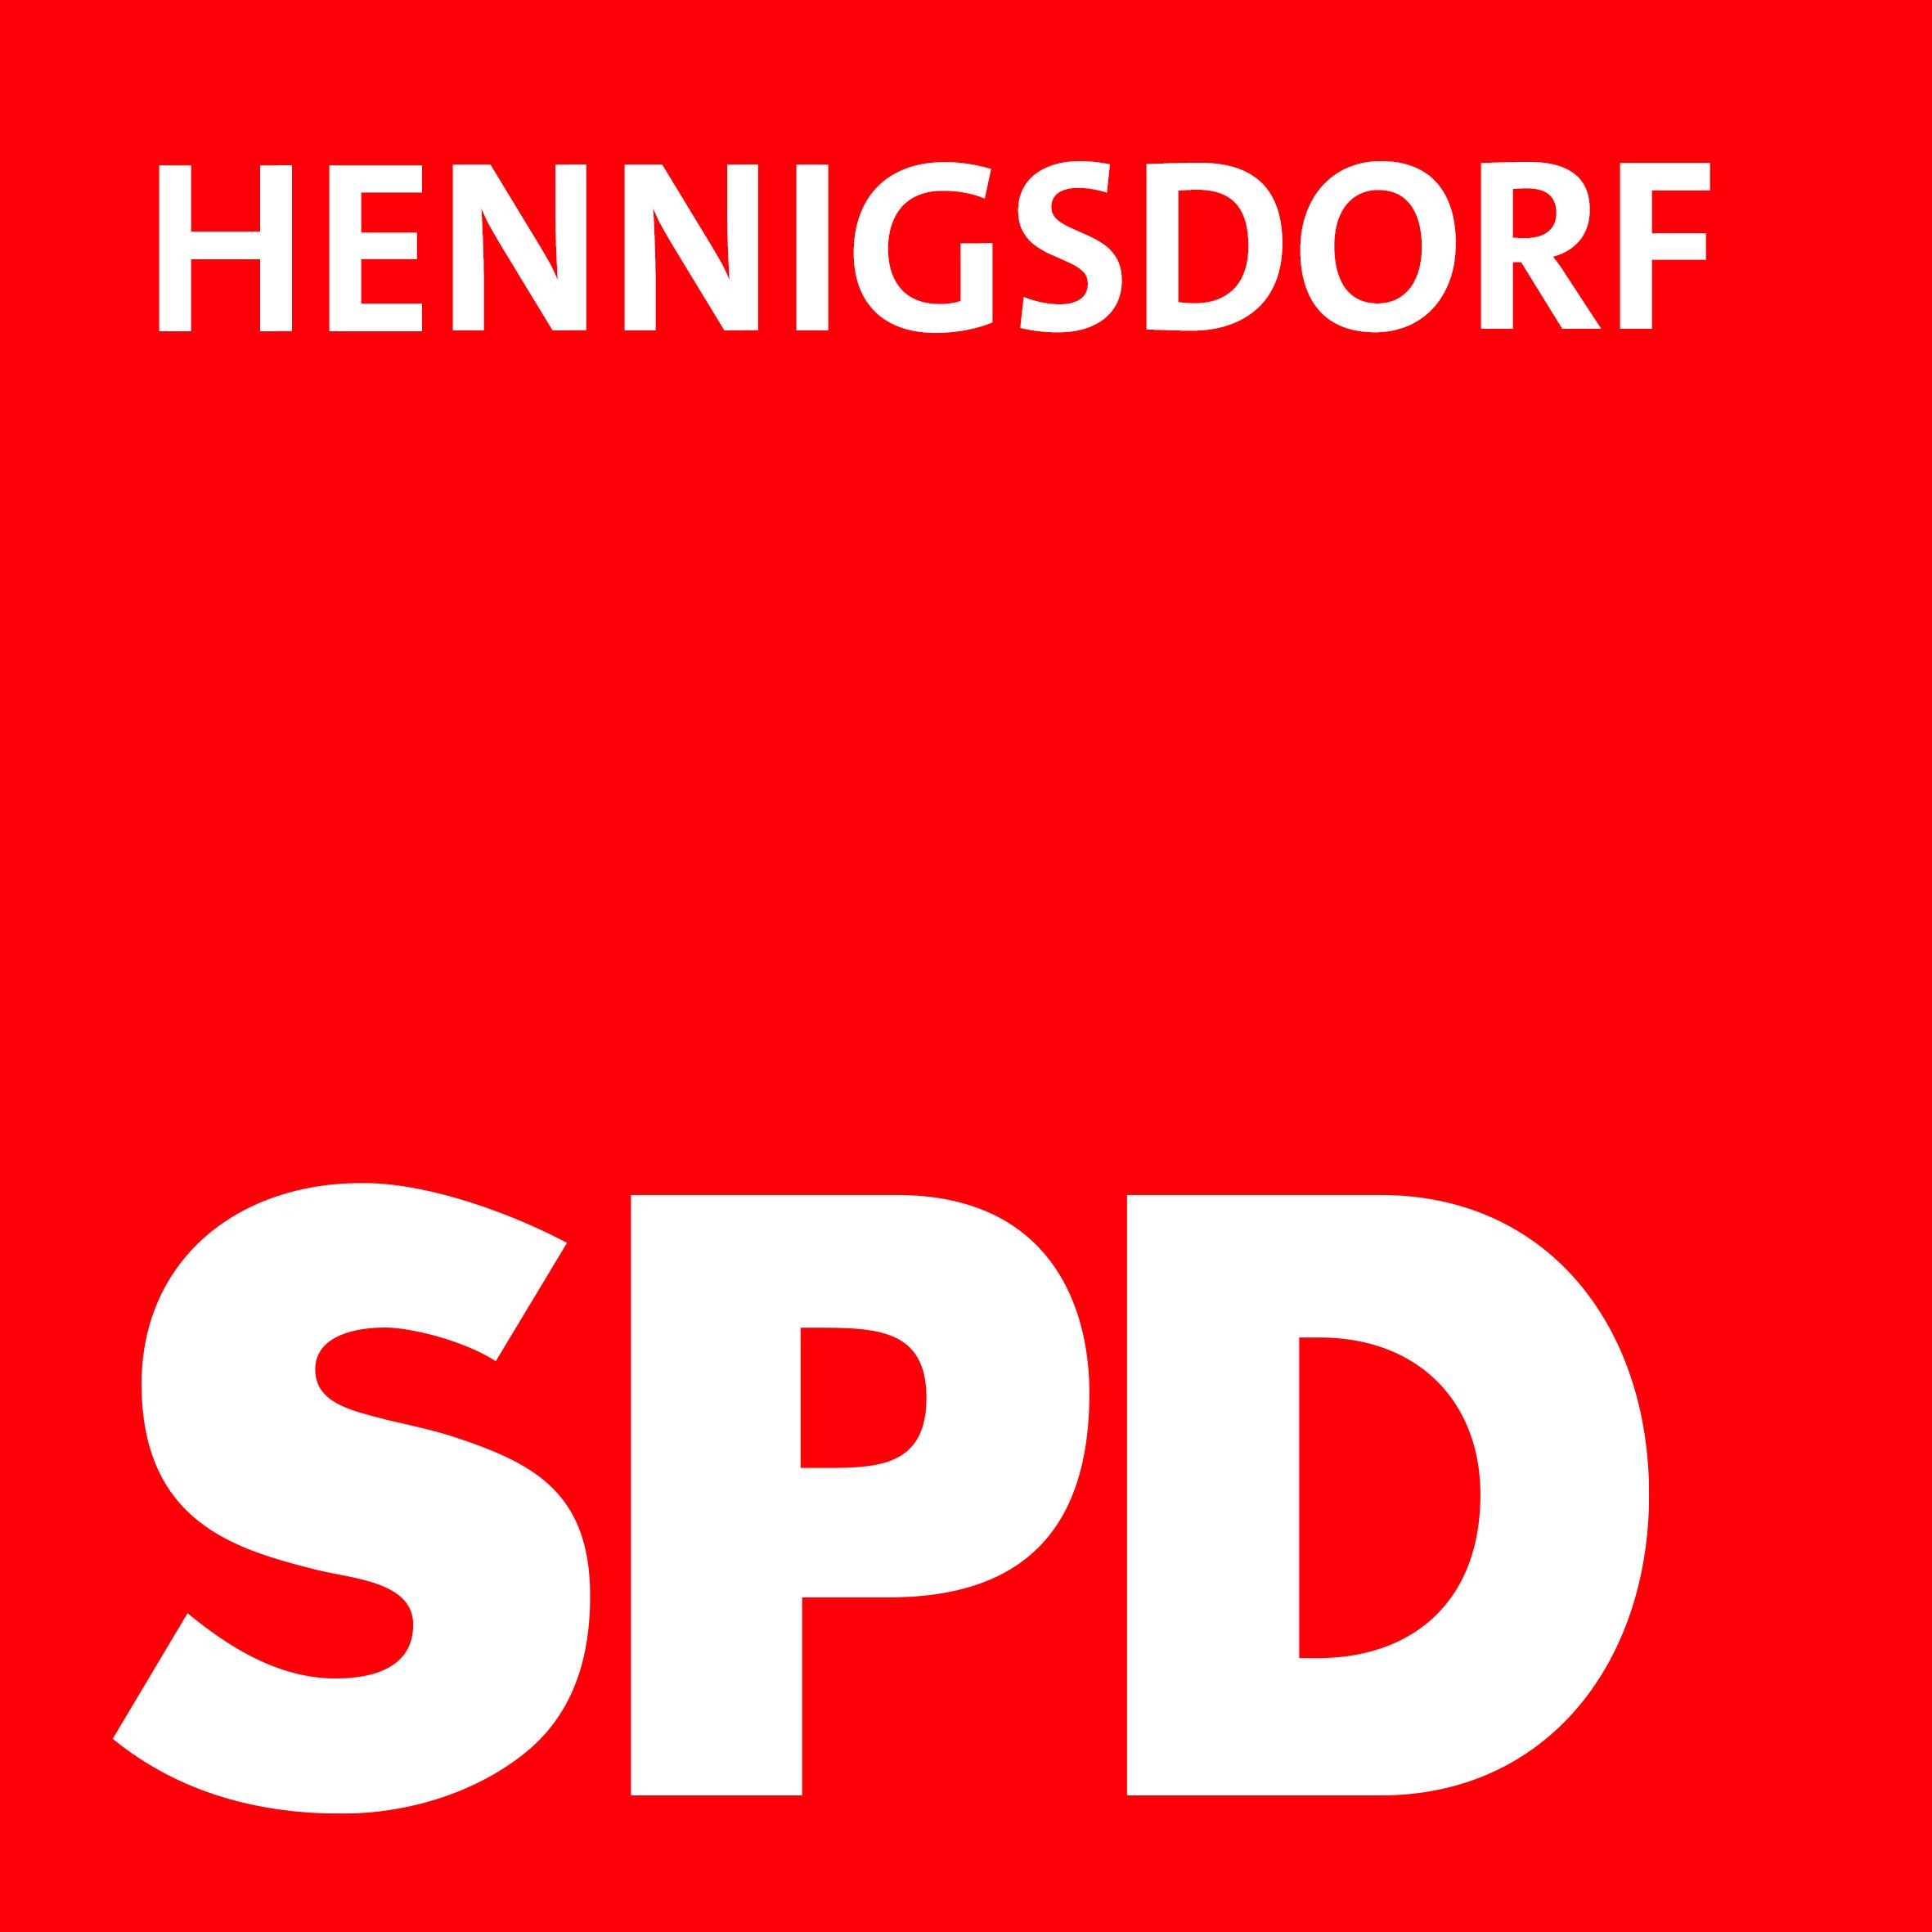 SPD Hennigsdorf